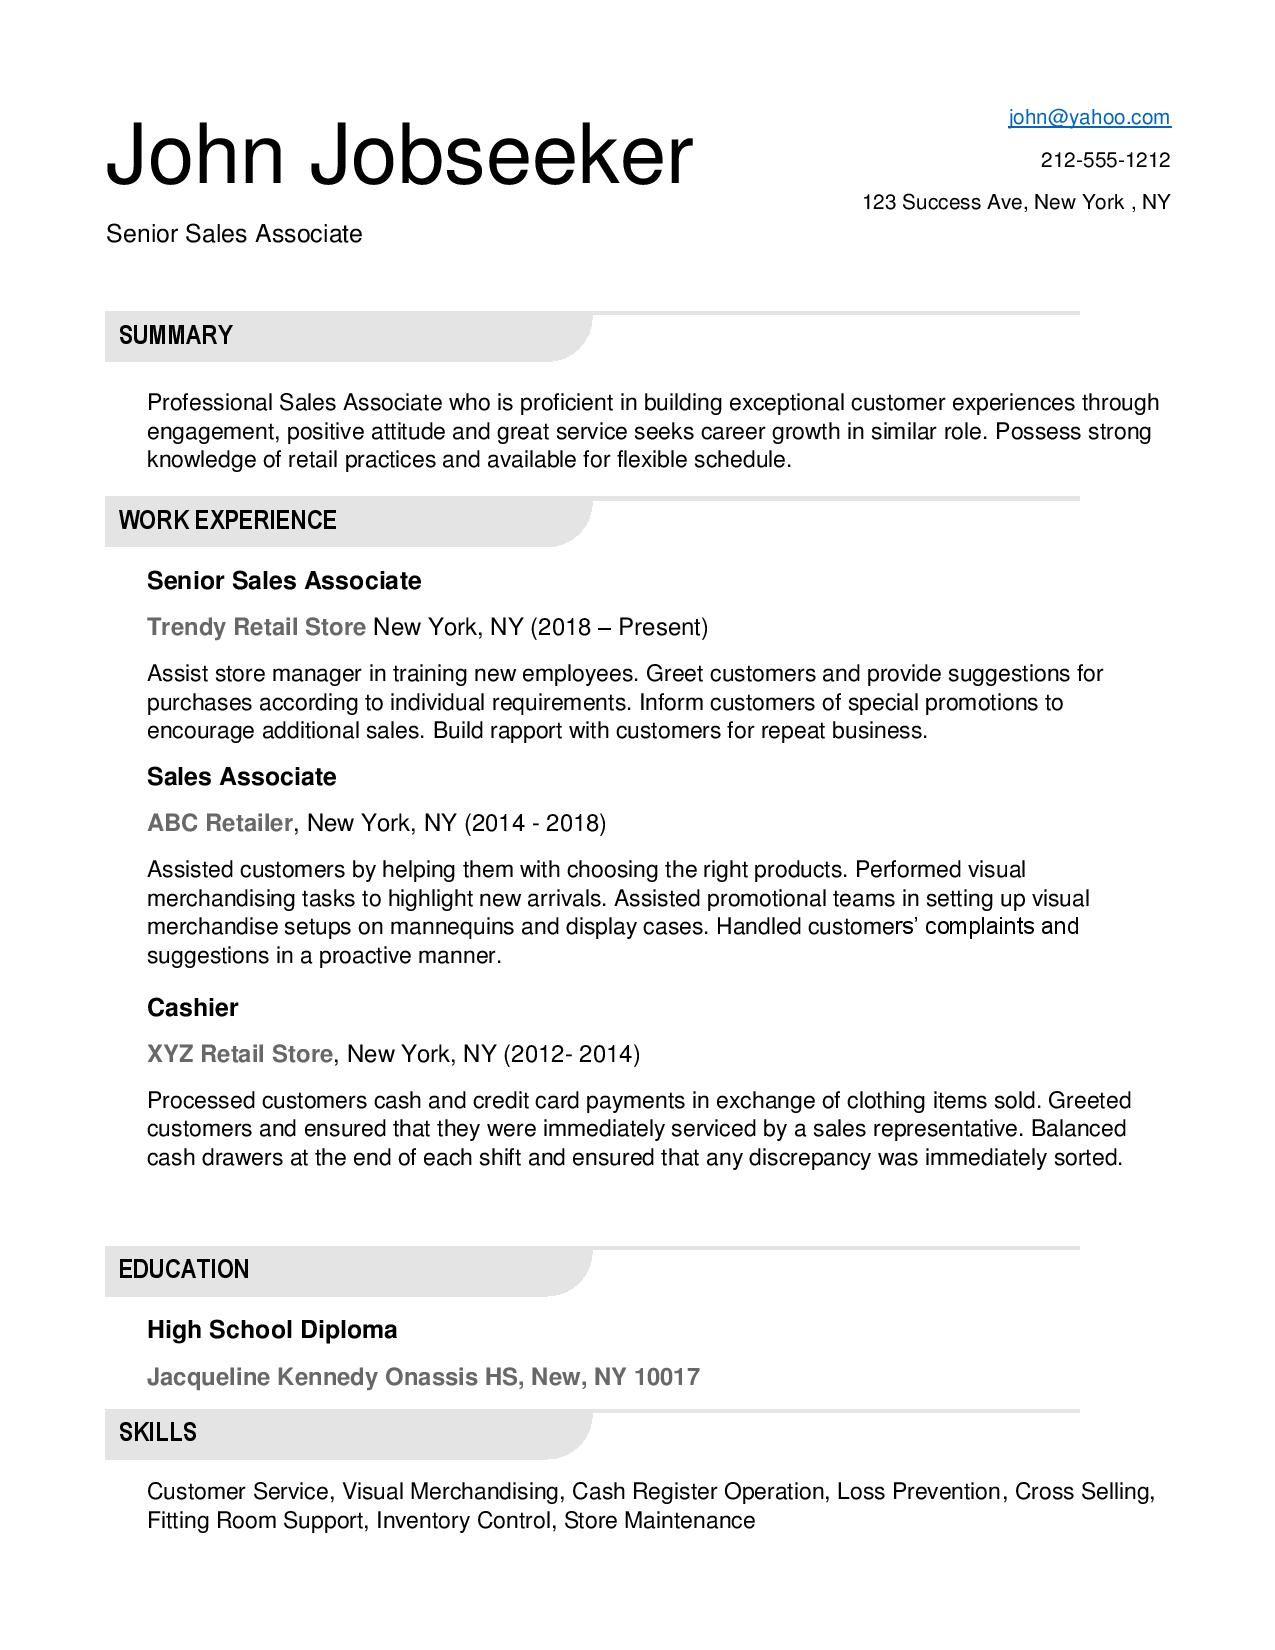 Retail Resume Examples Resume Downloads Retail resume